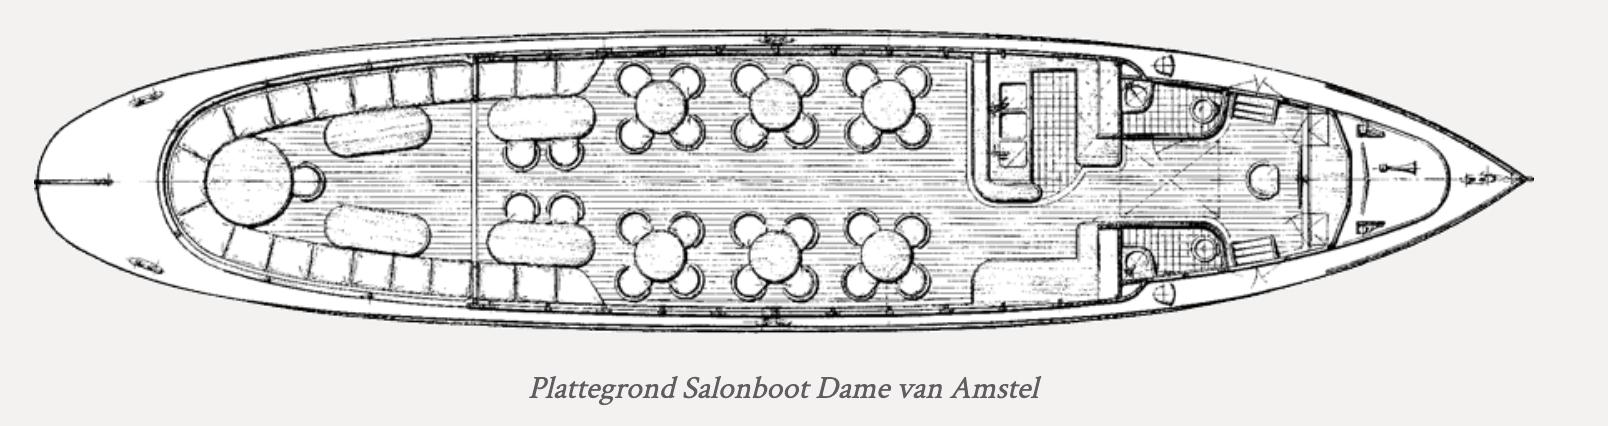 Salonboot Dame van amstel plattegrond